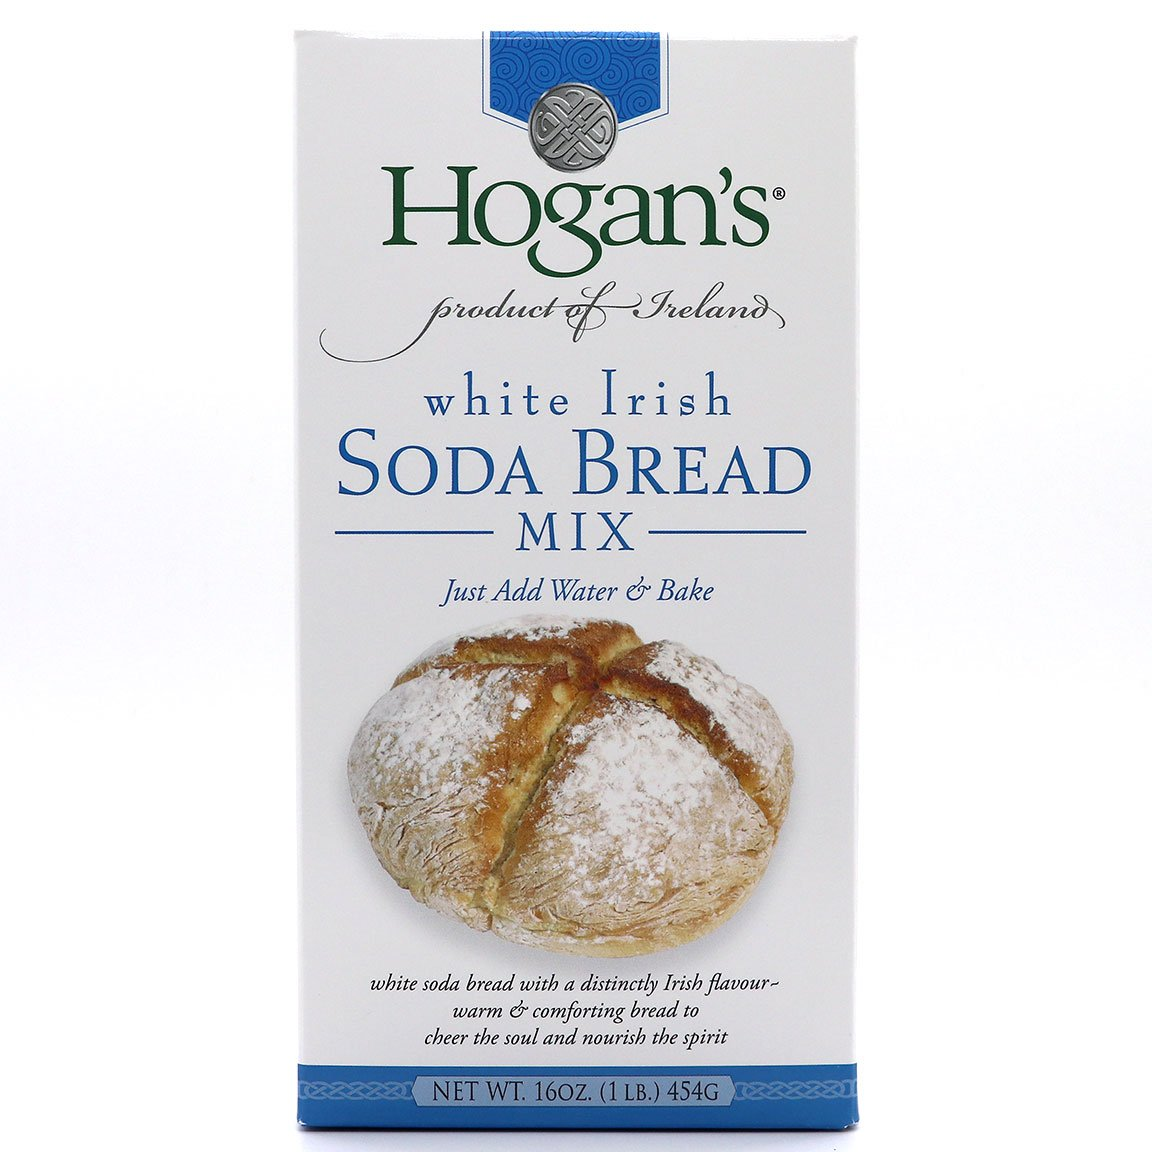 Hogan's White Irish Soda Bread Mix